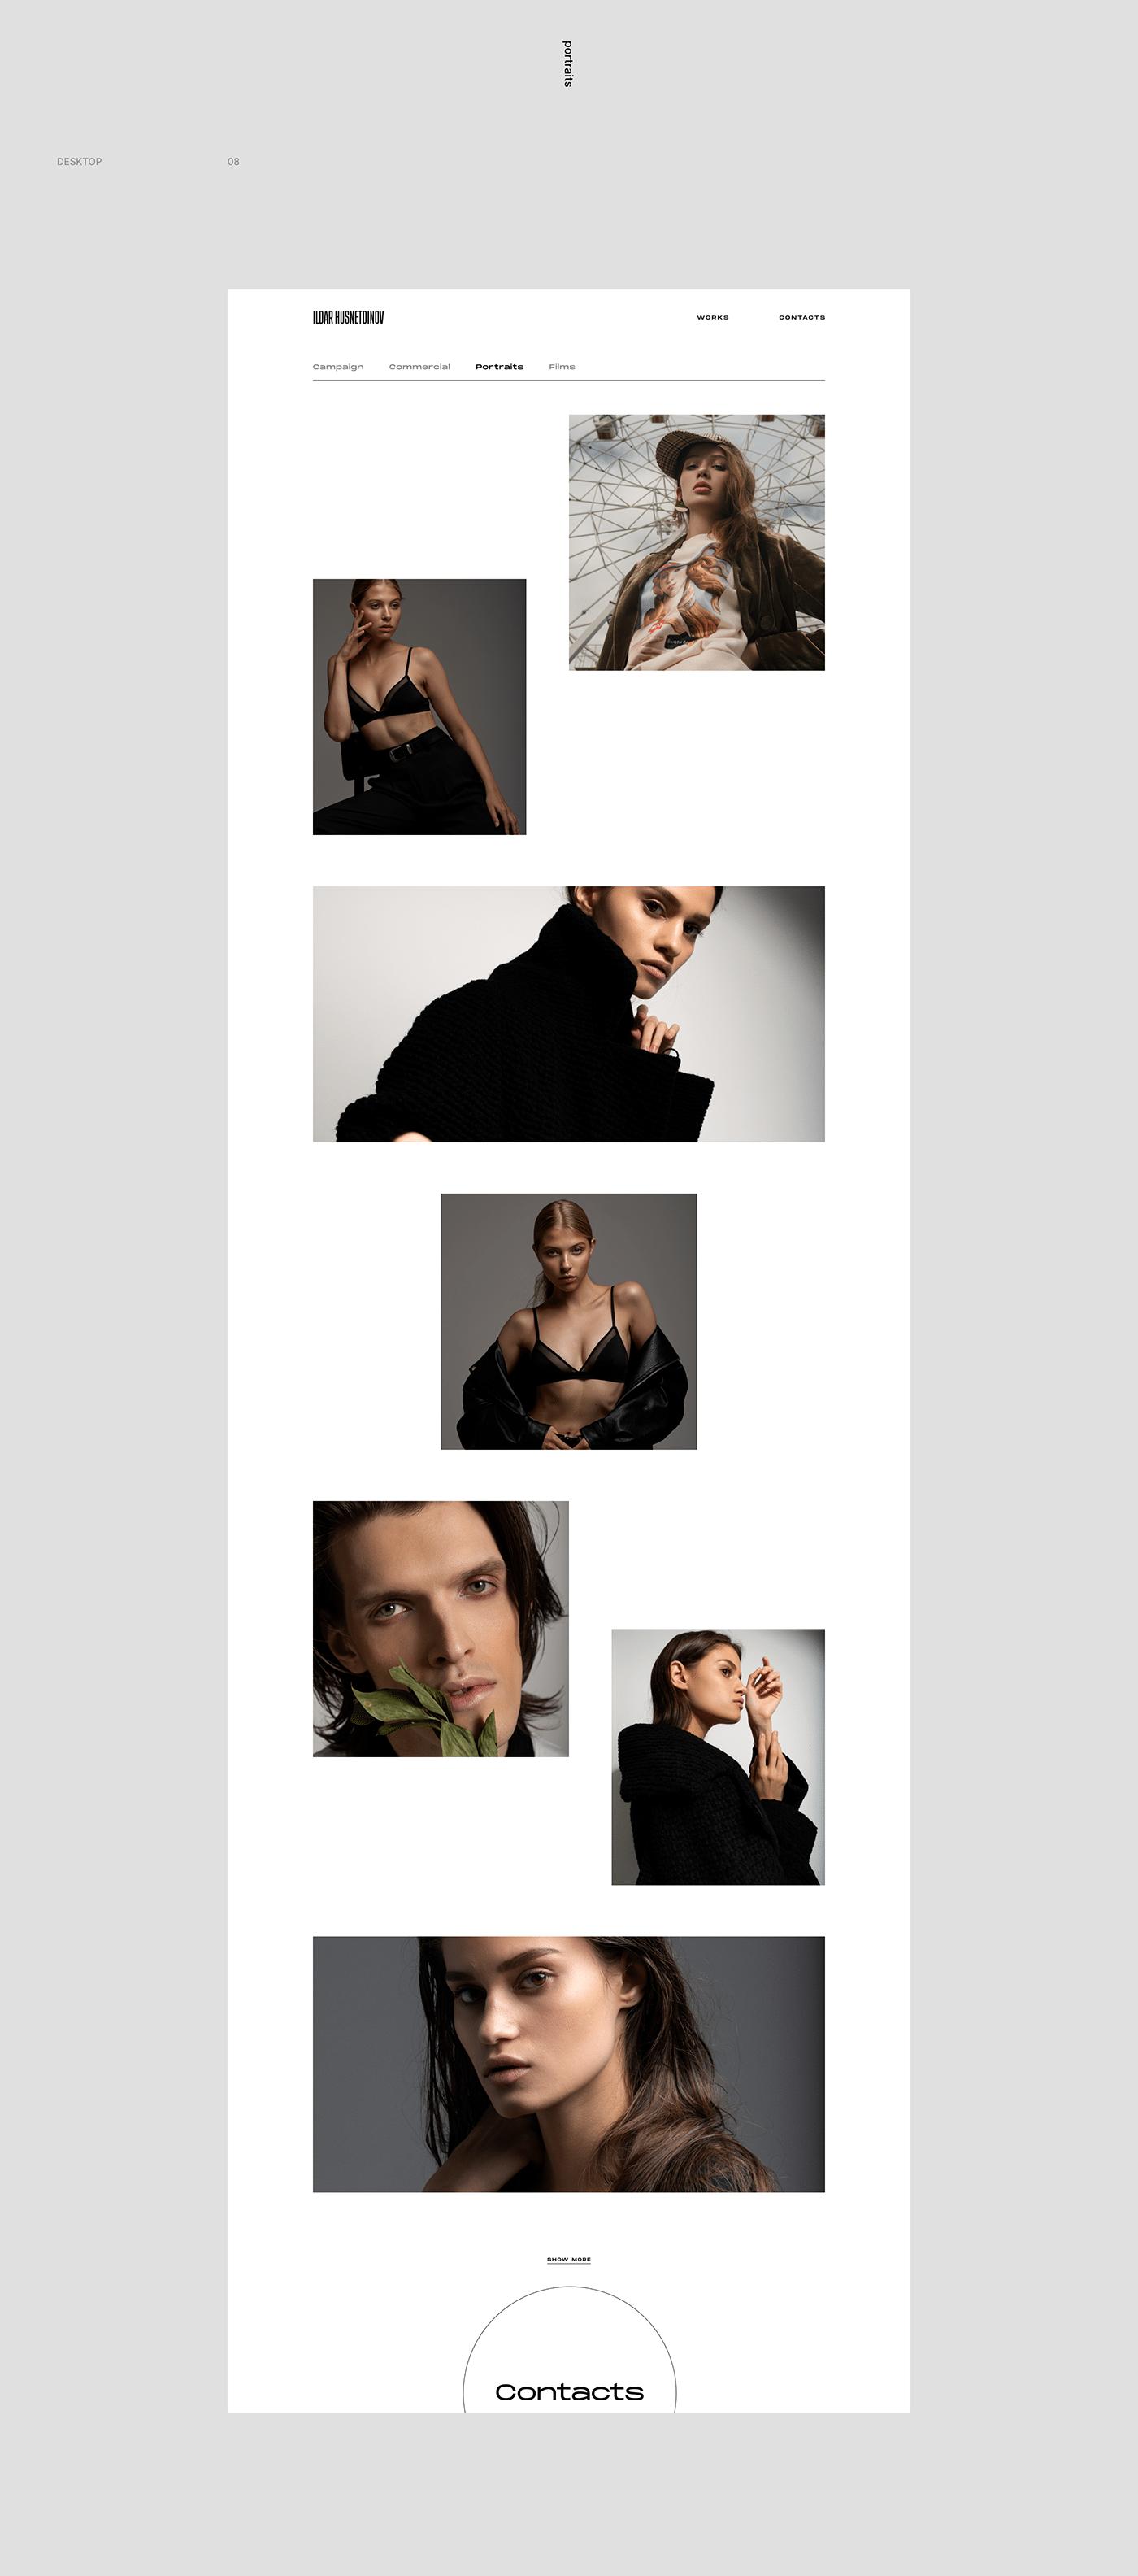 adobe Adobe After Effects Adobe Photoshop adobexd Fashion  Figma photographer portfolio responsiveness UI/UX